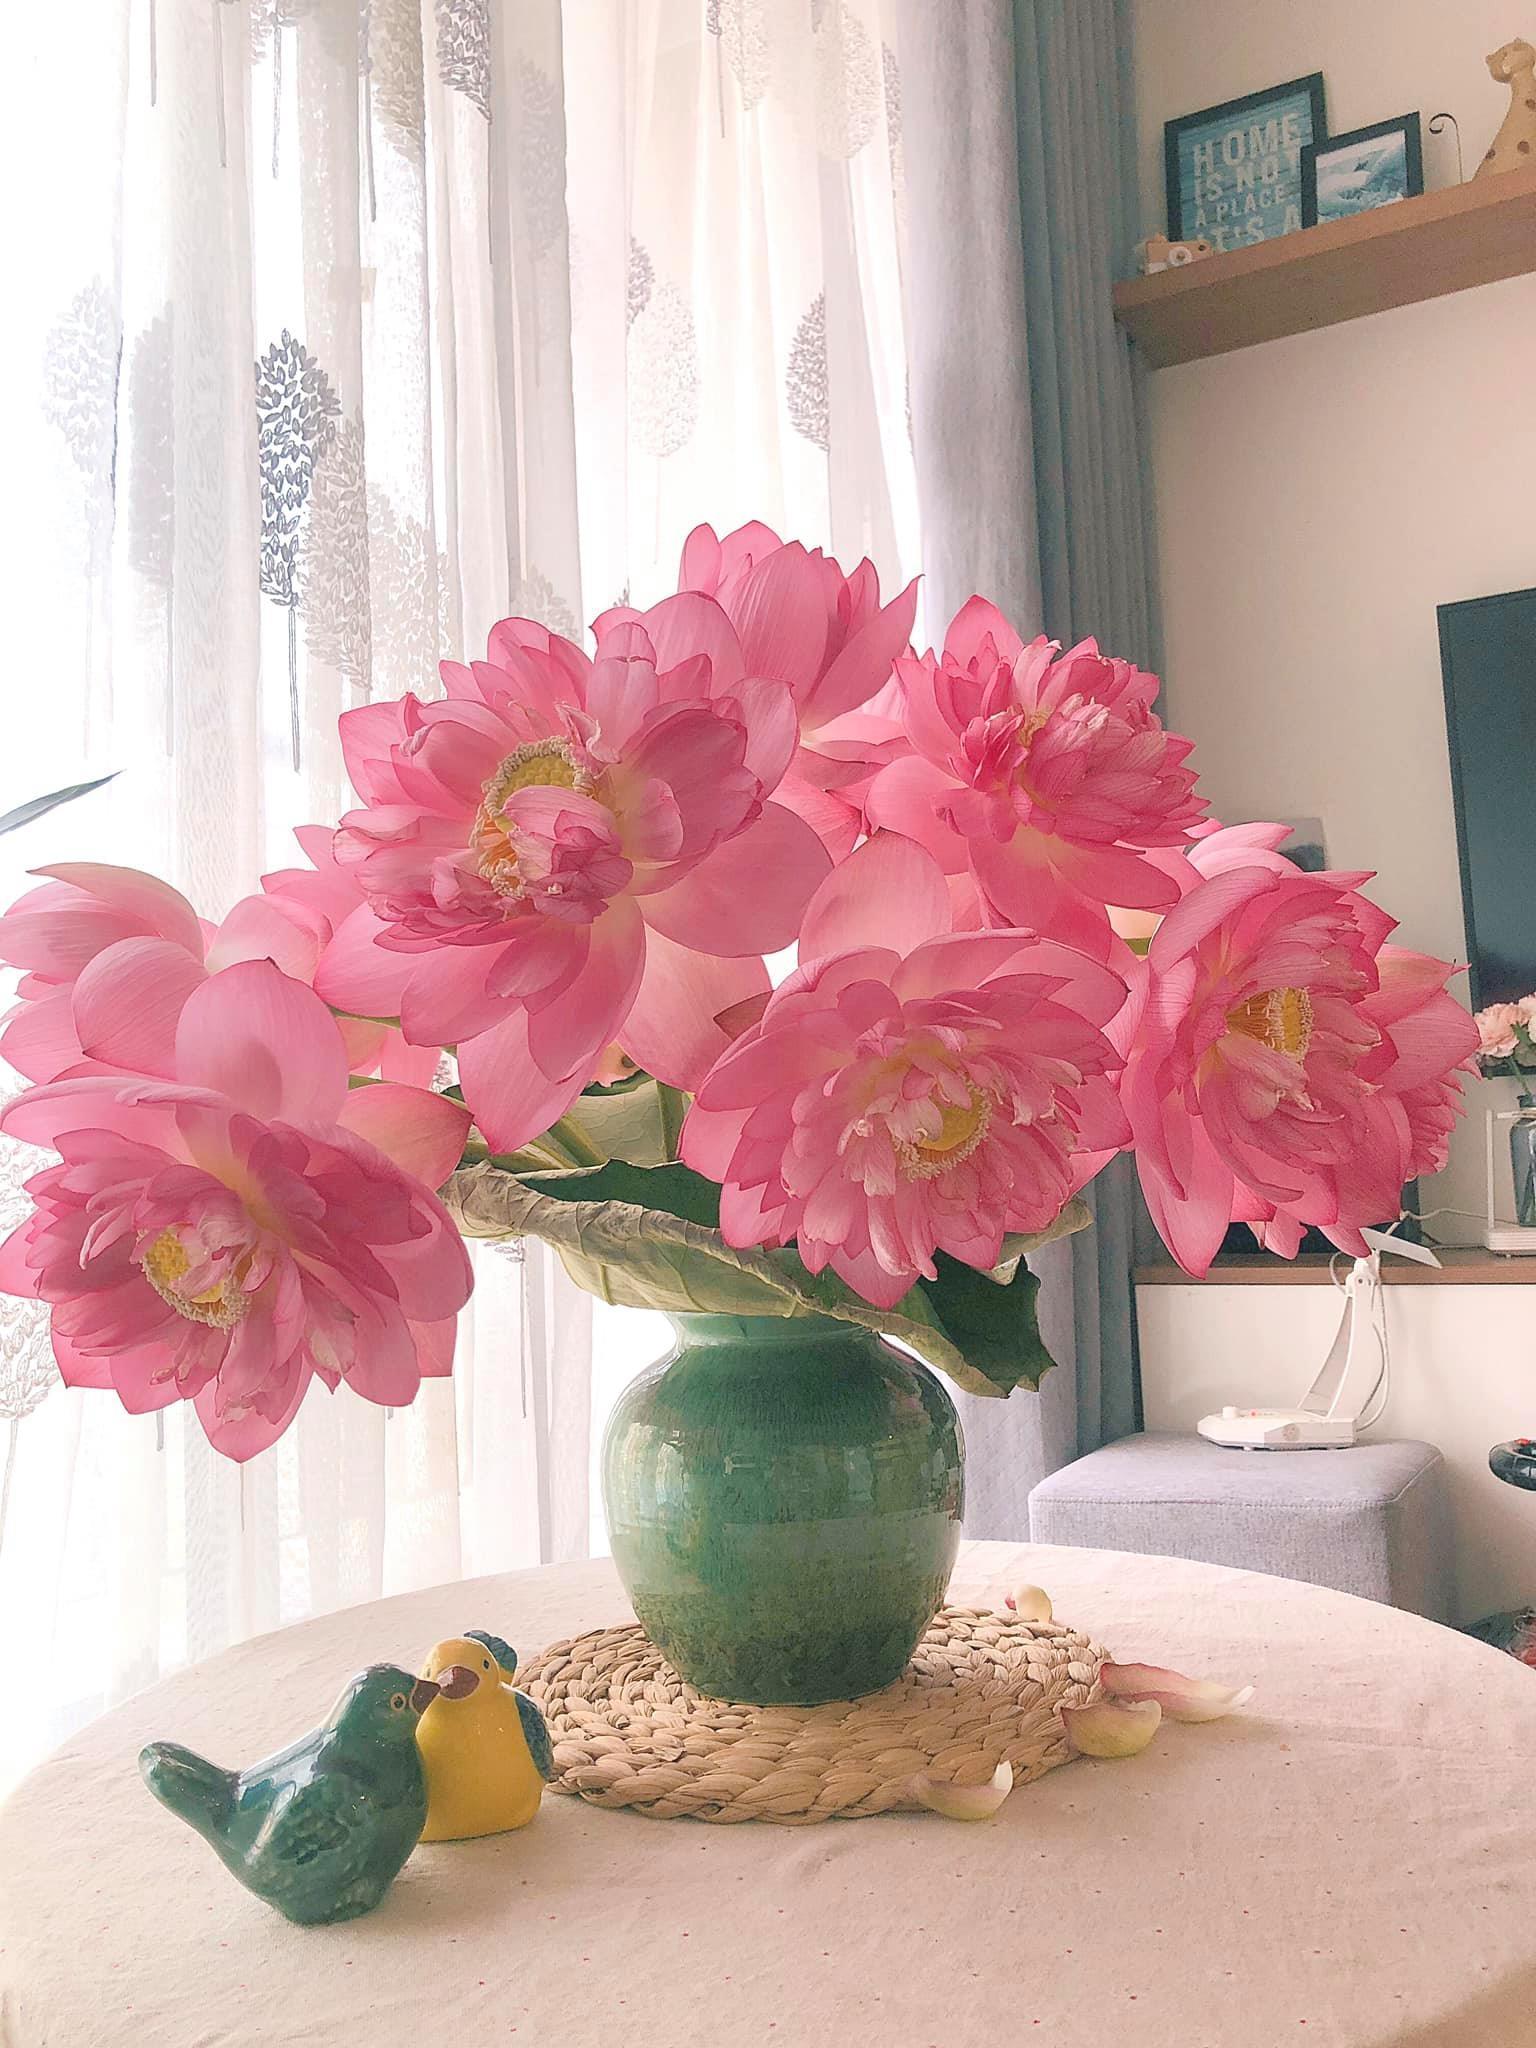 Recipe: Lotus petals spring rolls